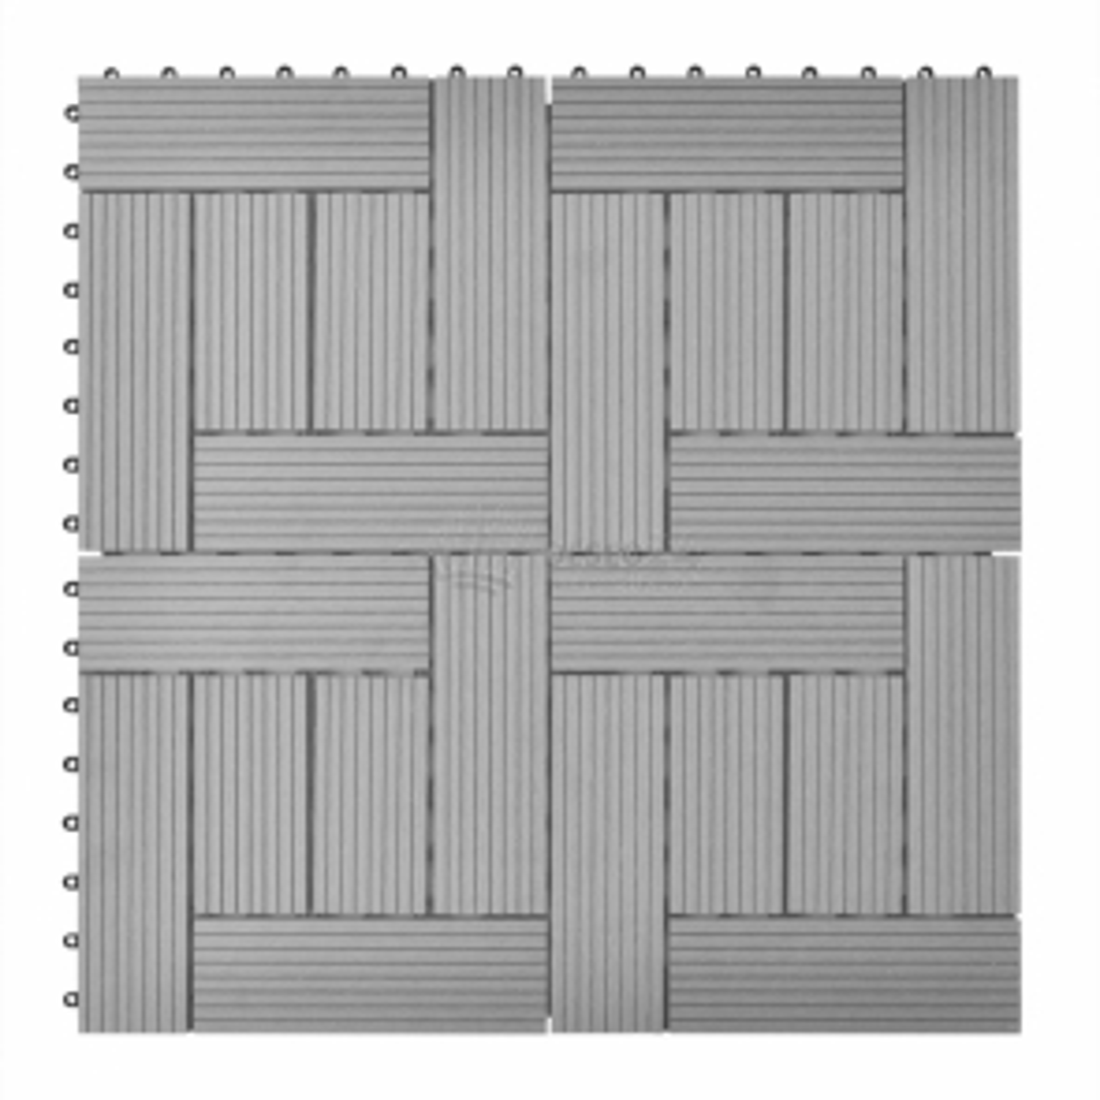 Šedé terasové dlaždice WPC 11 ks, 30x30 cm, 1 m2